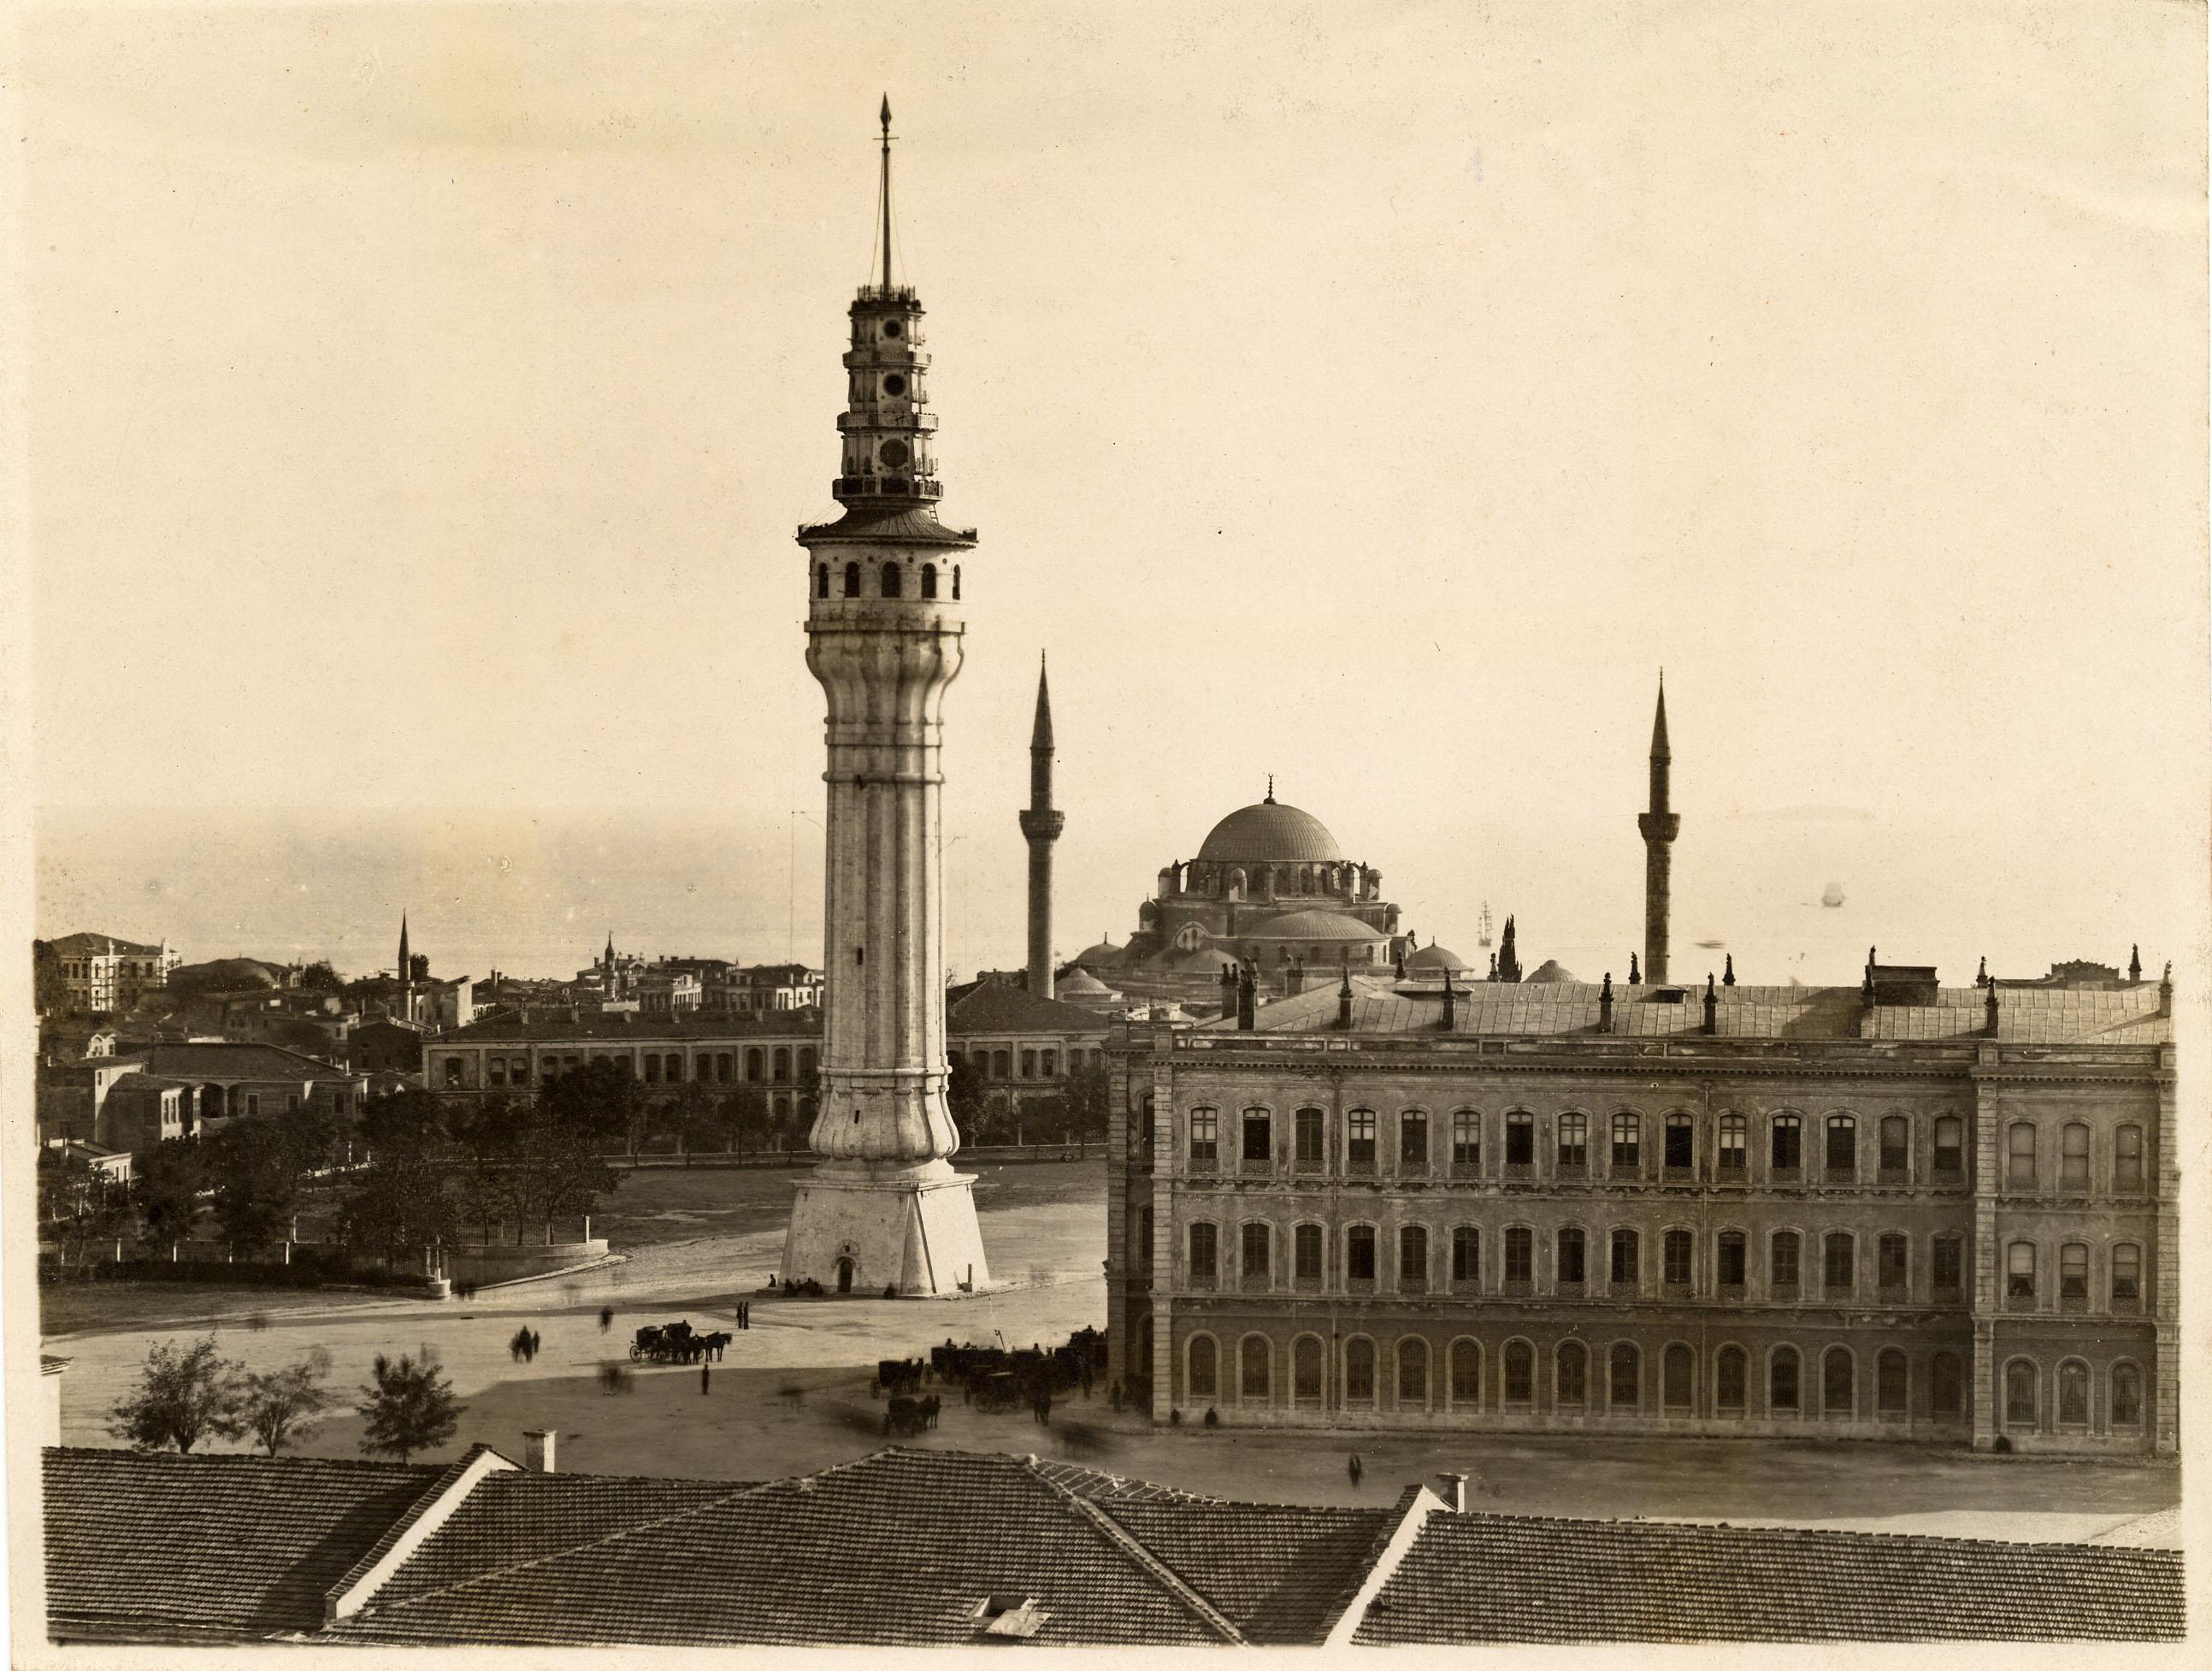 File:Beyazıt Tower, İstanbul (12967655285).jpg - Wikimedia Commons